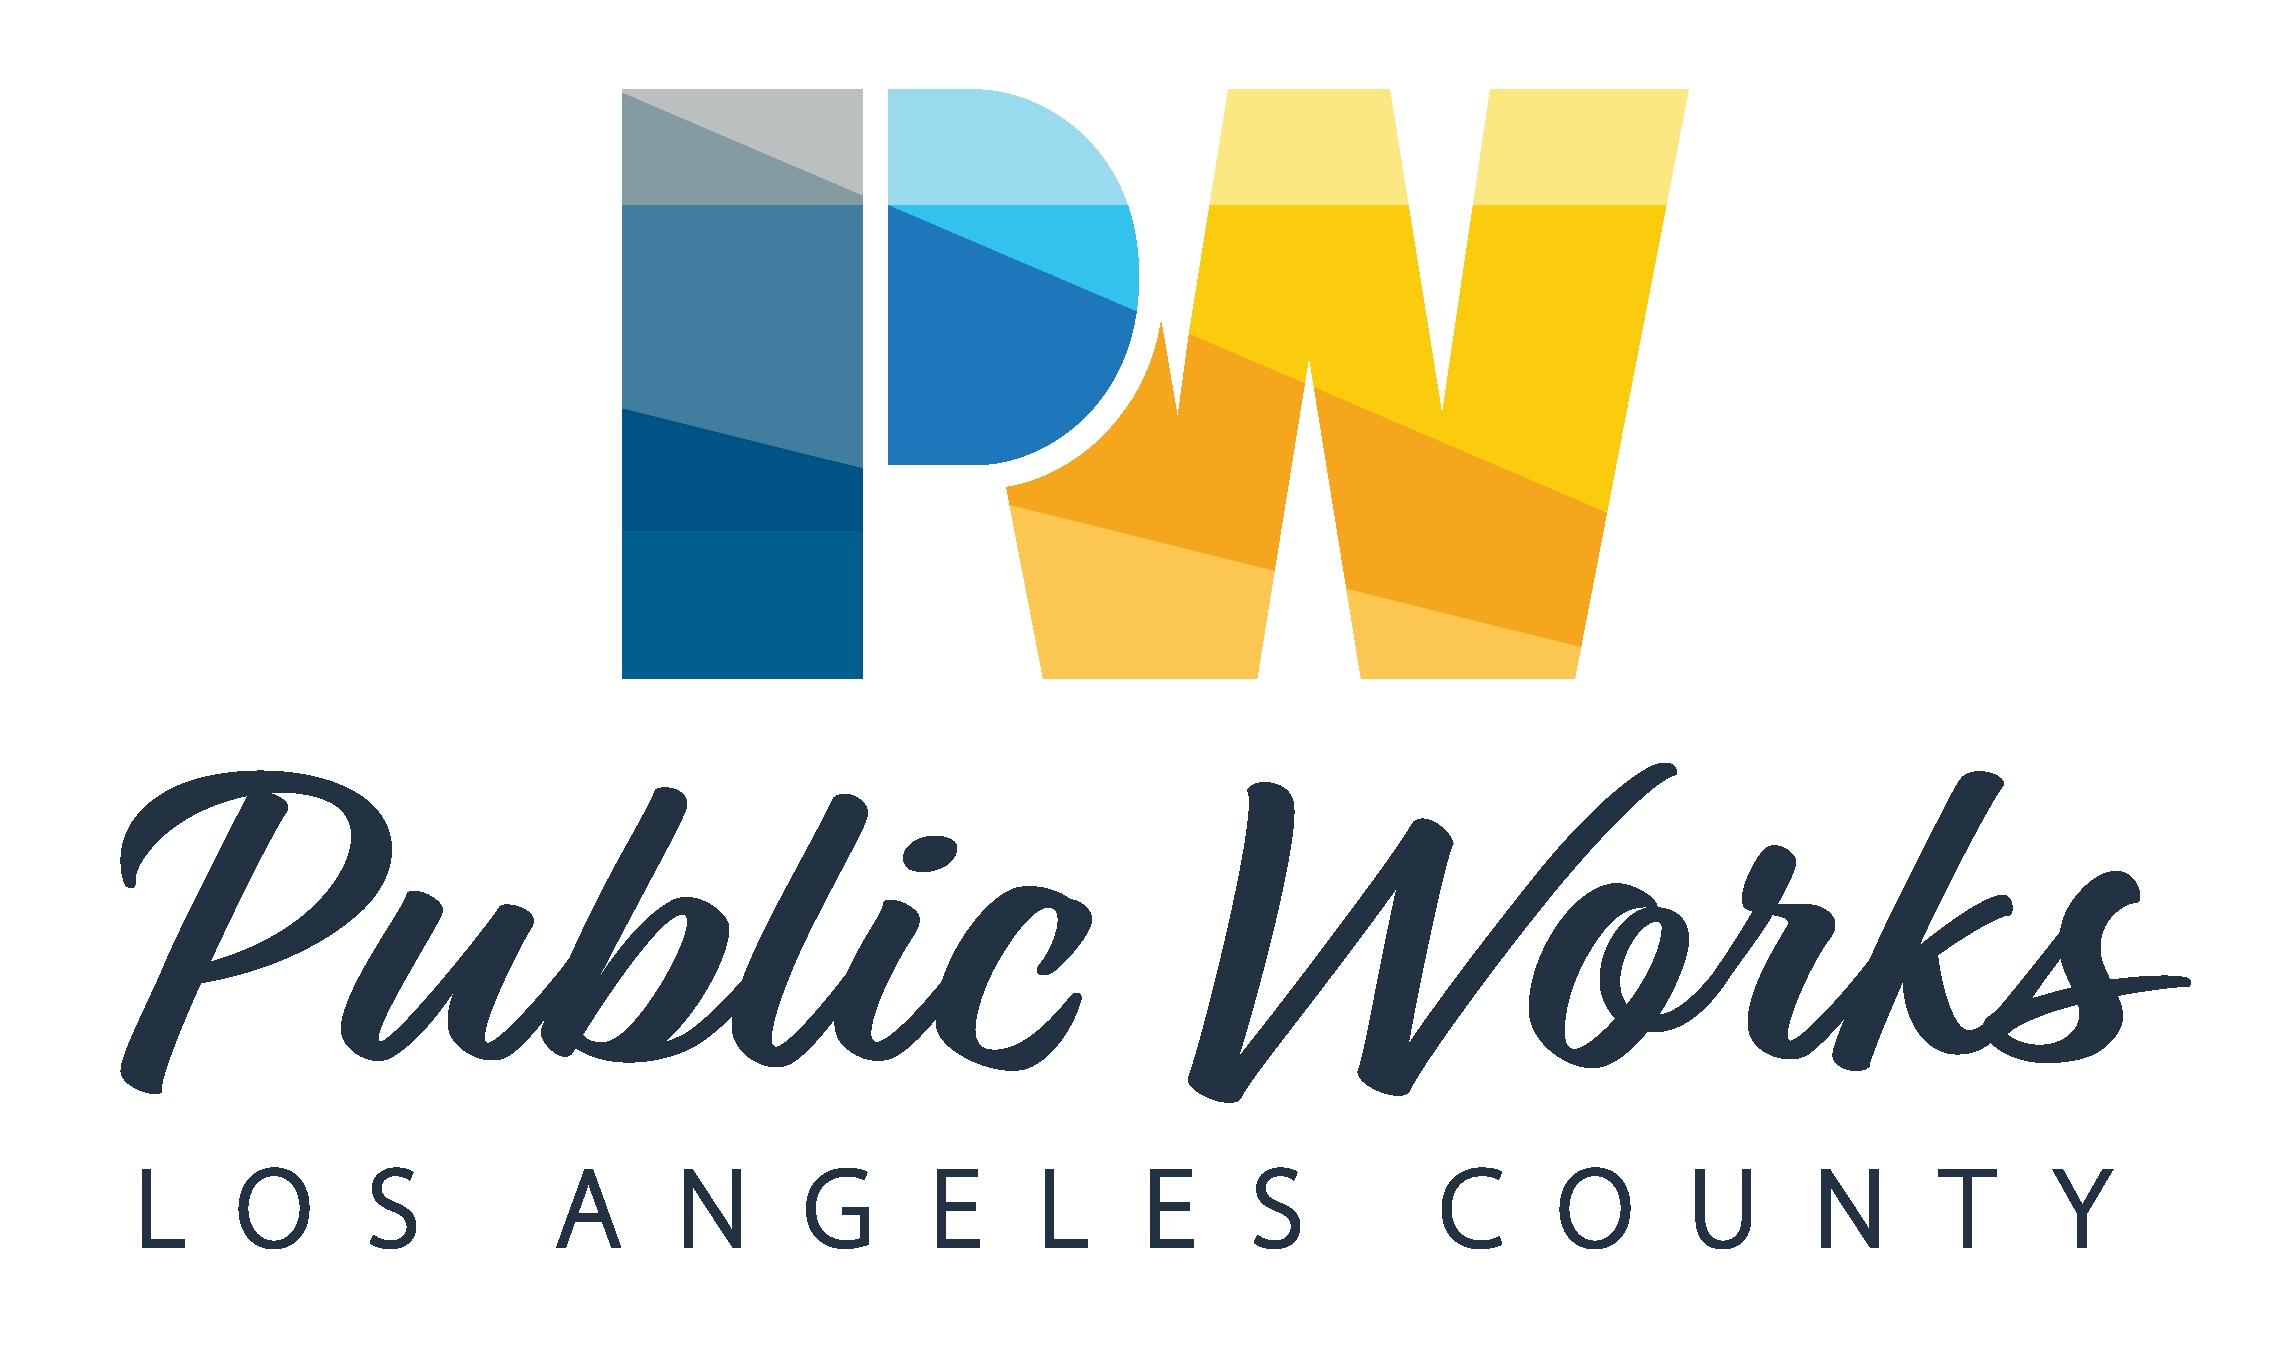 La County Department Of Public Works | Verdexchange with regard to La County Public Works